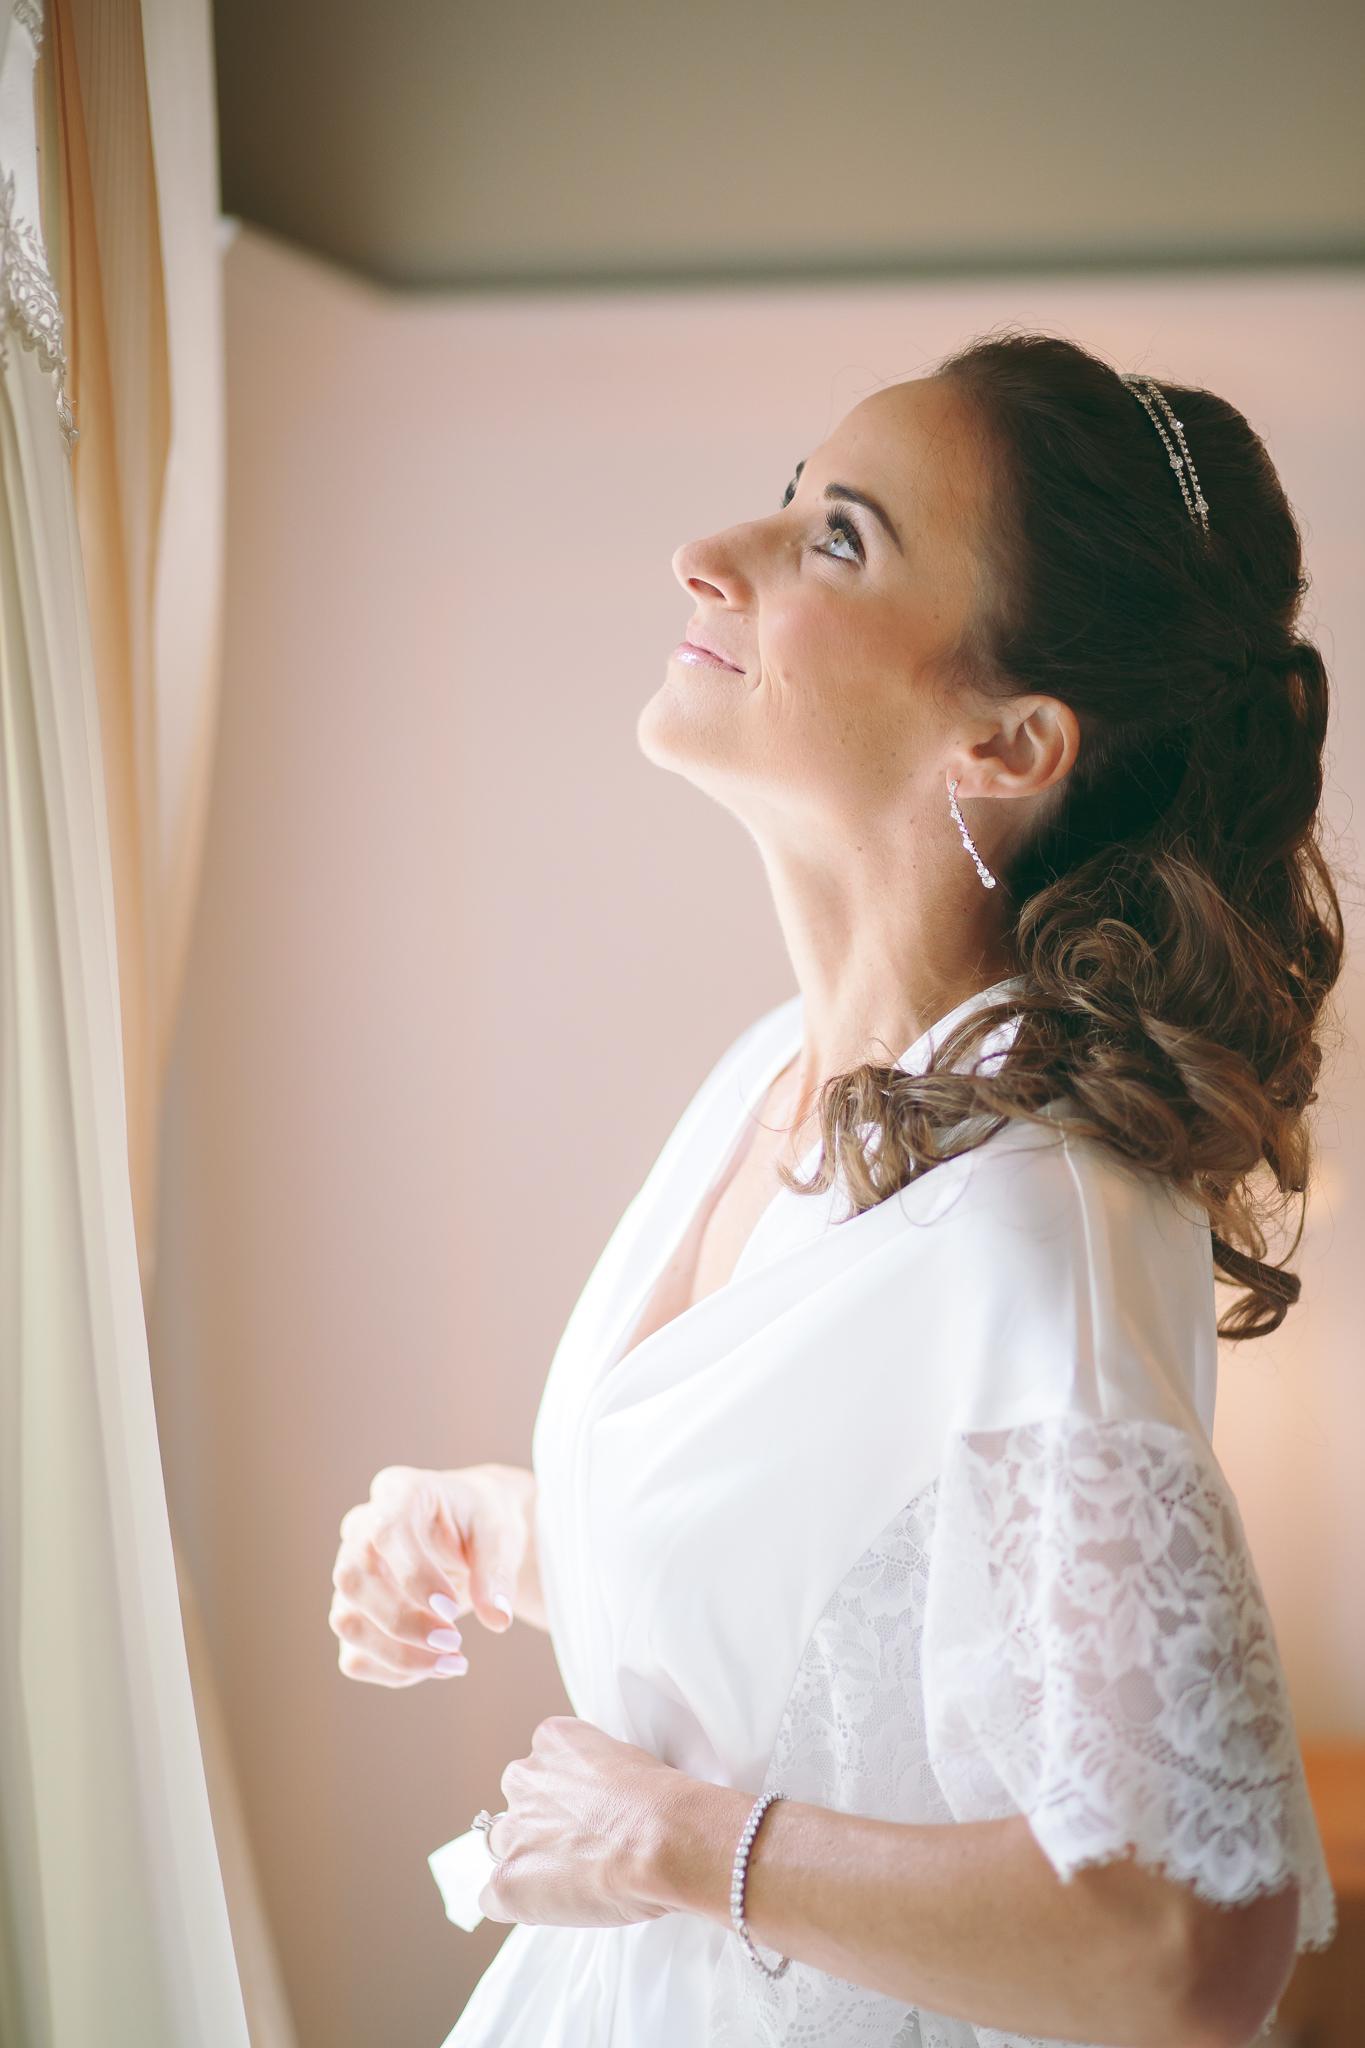 Amy D Photography- Barrie Wedding Photography- Bride Getting Ready- Muskoka Wedding Photography- Best Wedding Photographers (122 of 130).jpg